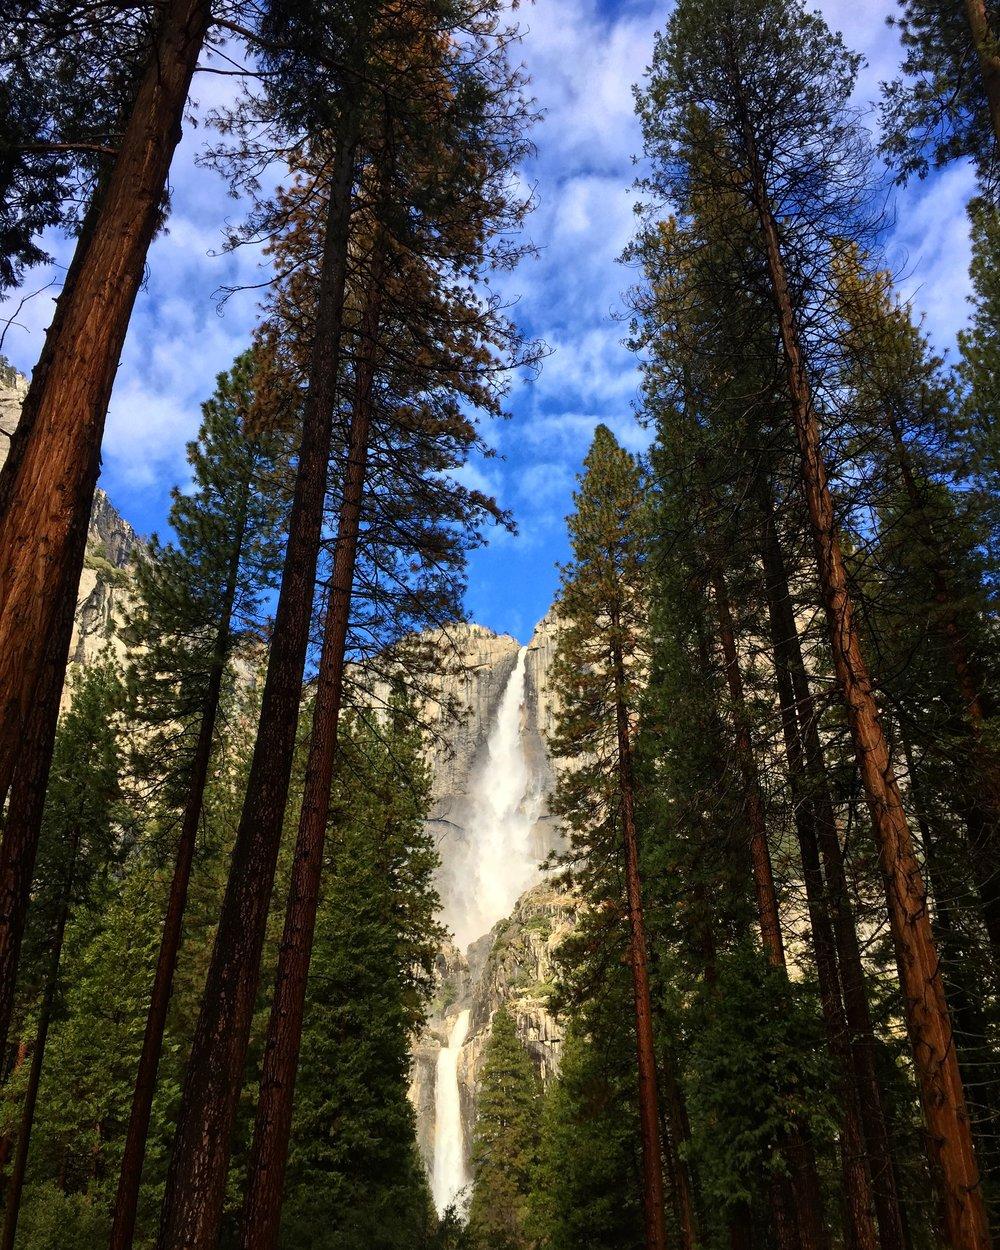 Upper and Lower Yosemite Falls, Yosemite National Park